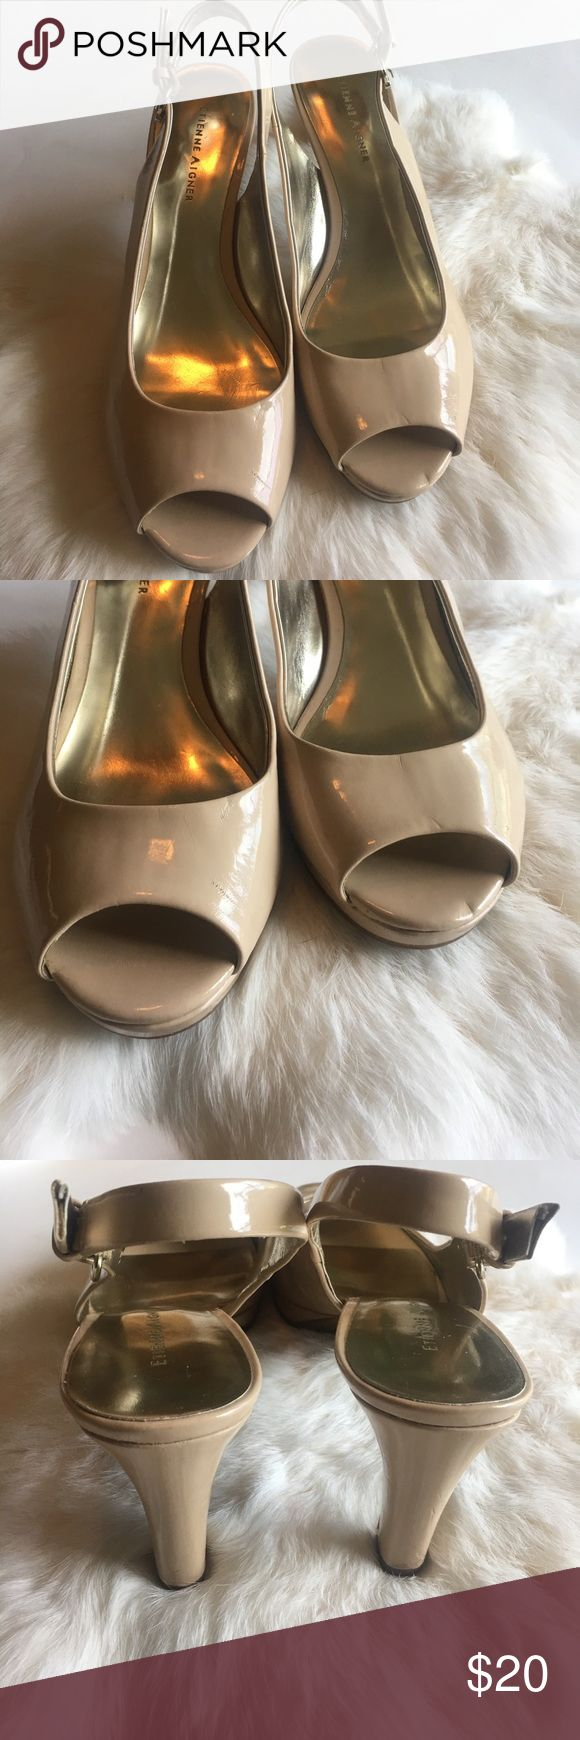 Beige Pumps Super cute beige pumps. All manmade materials. Normal wear. 8.5M. EUC Etienne Aigner Shoes Heels